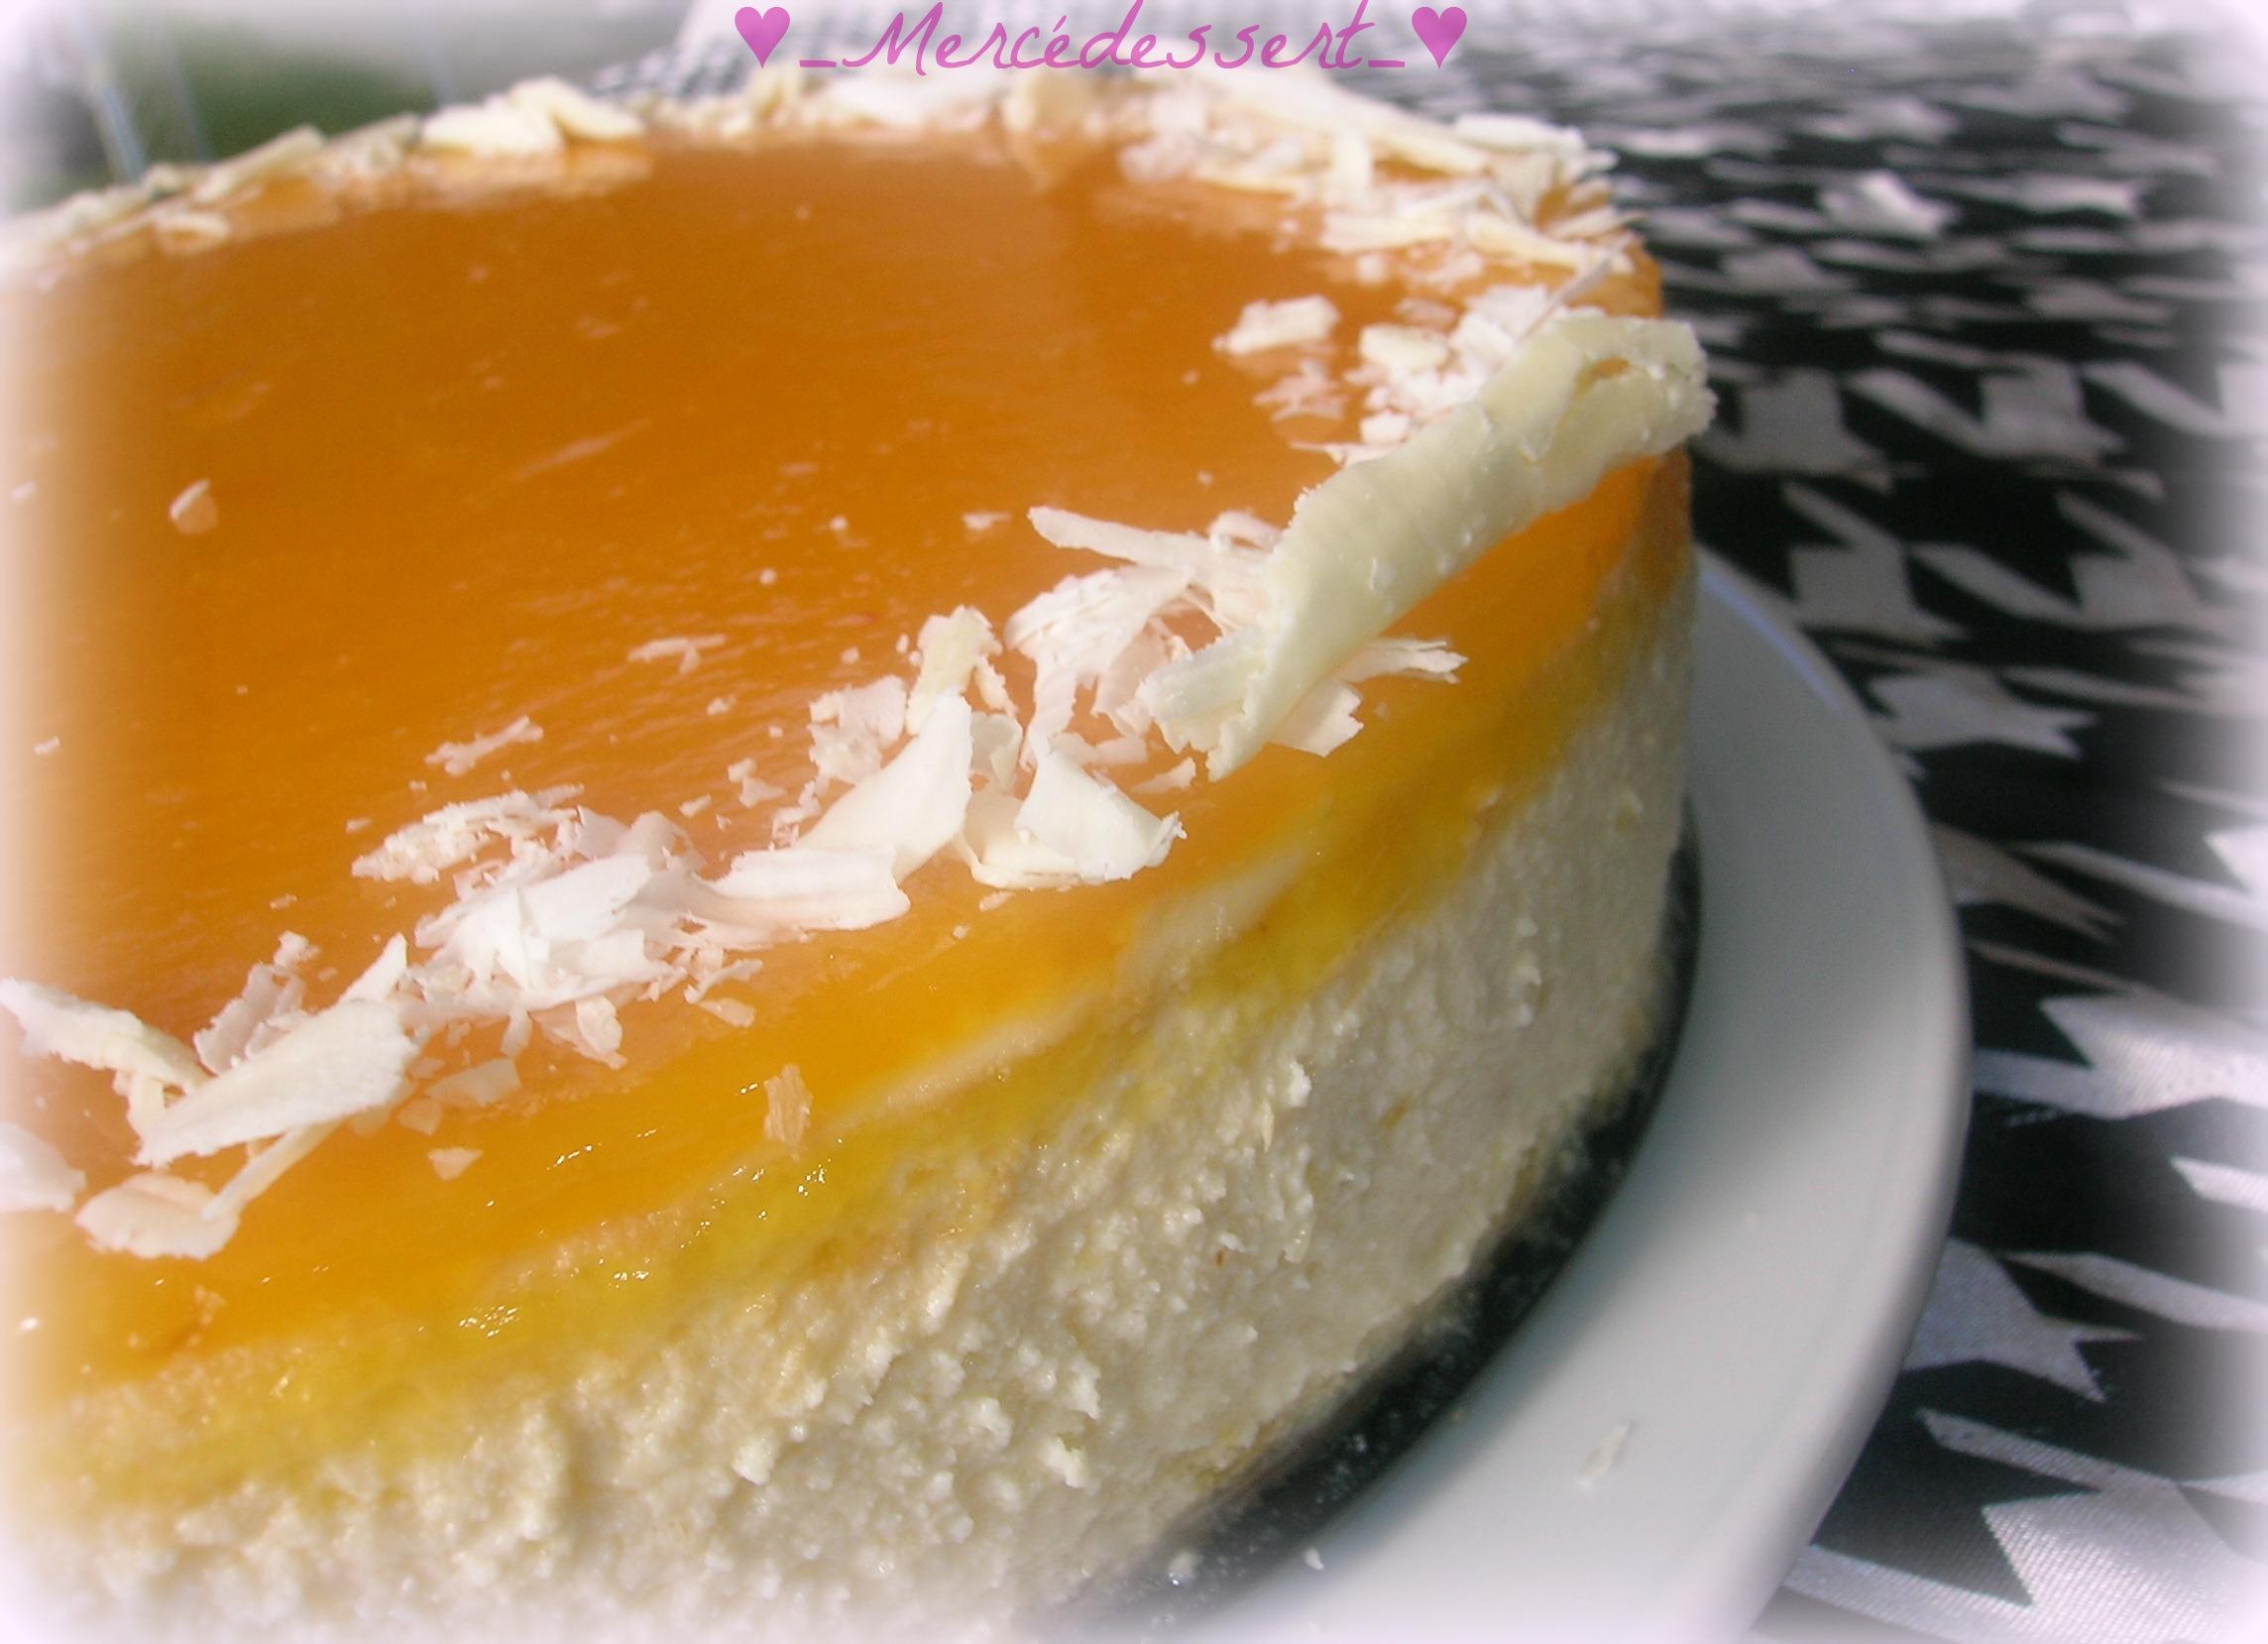 Cheesecake la mangue par merc dessert - Cheesecake philadelphia fromage blanc ...